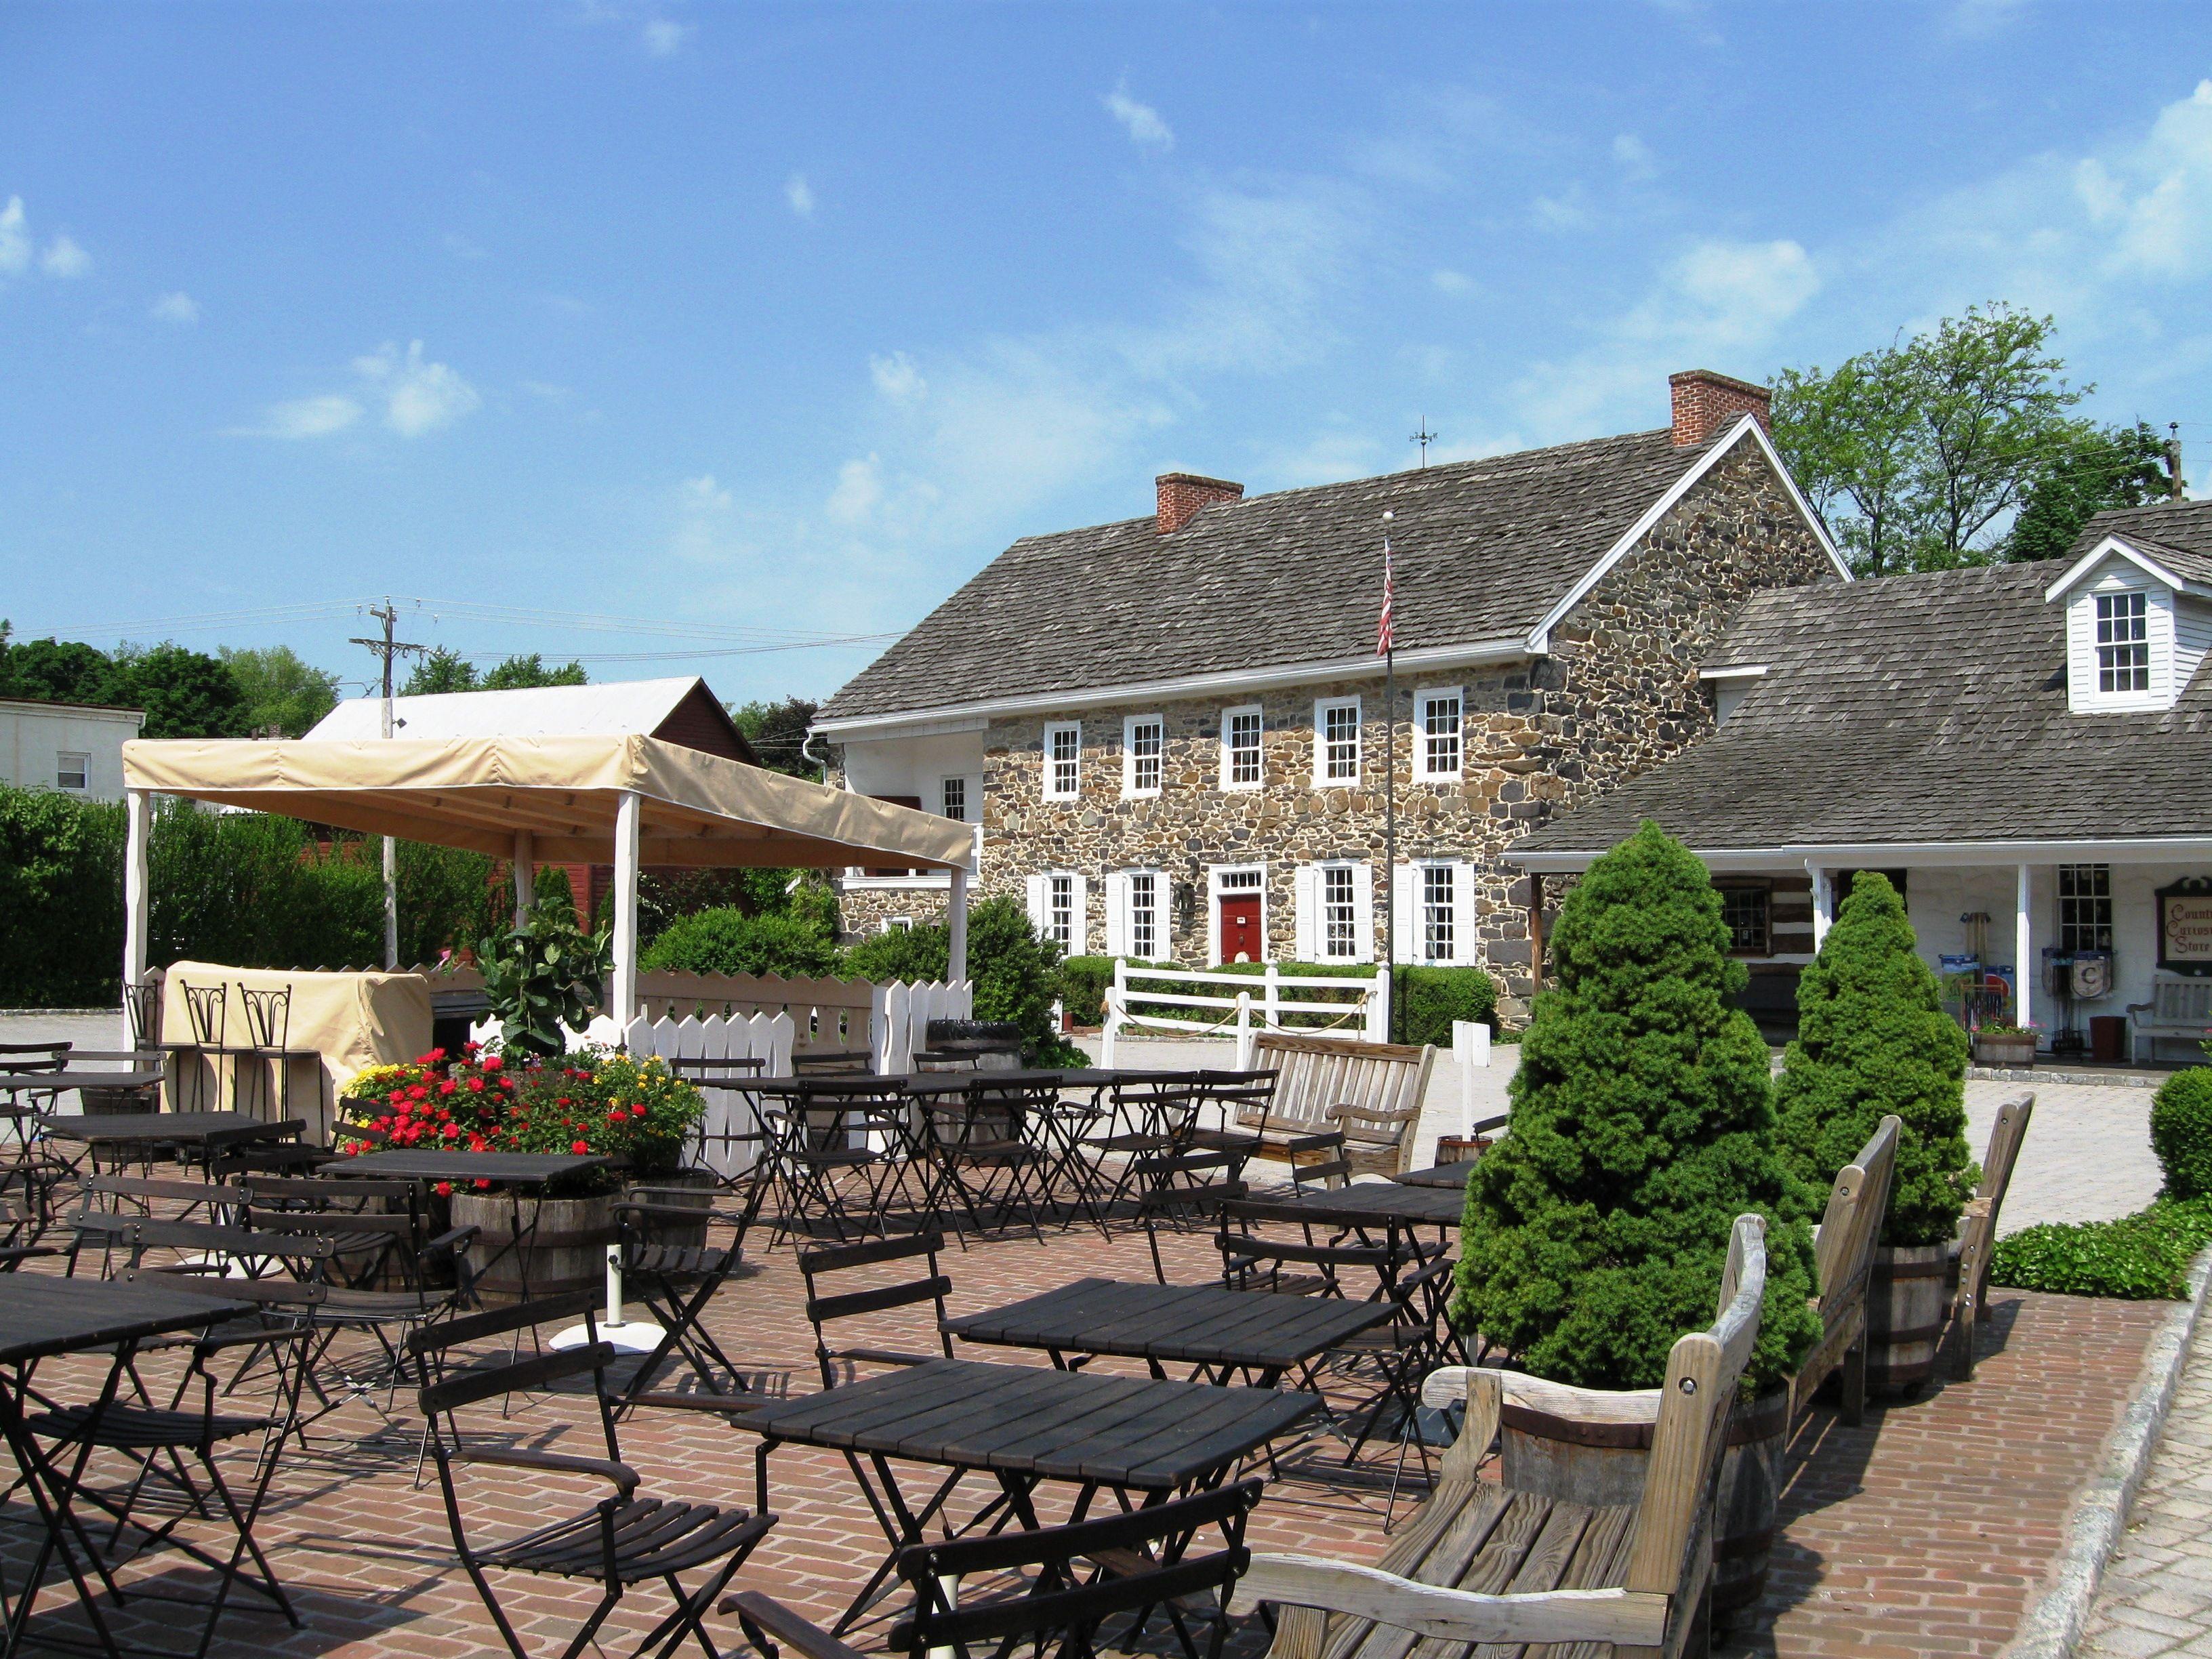 Dobbin House With Images Gettysburg National Military Park Civil War Gettysburg